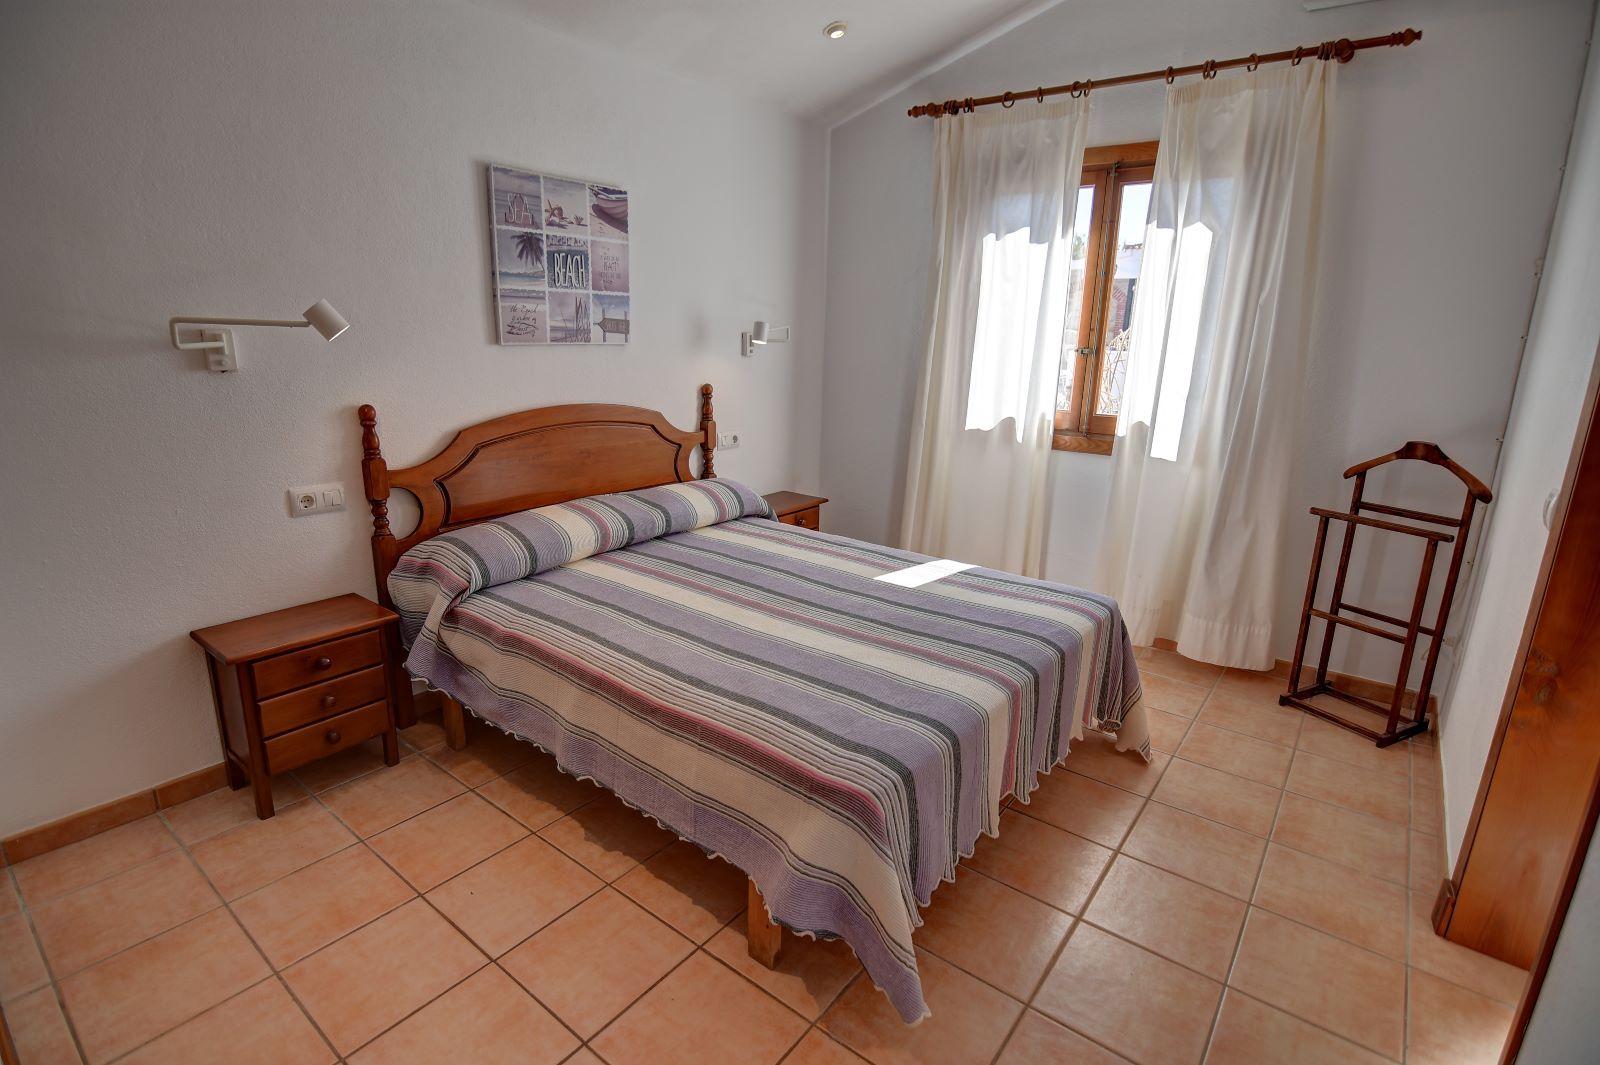 Villa in Cap D'Artruitx Ref: H2589 7